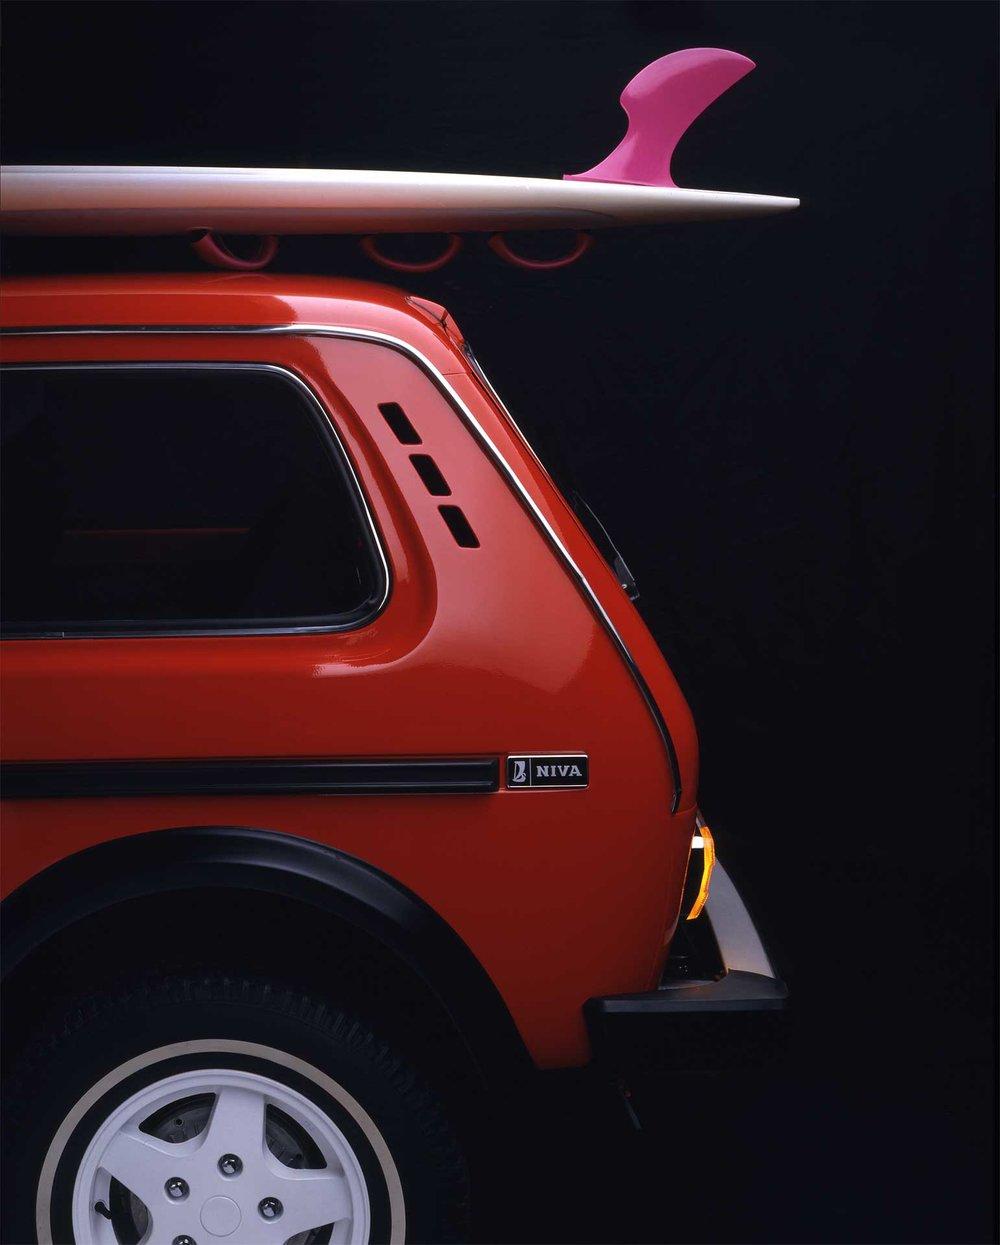 red_car_surfboard_scandinavian_ad_russian_auto_Lada.jpg